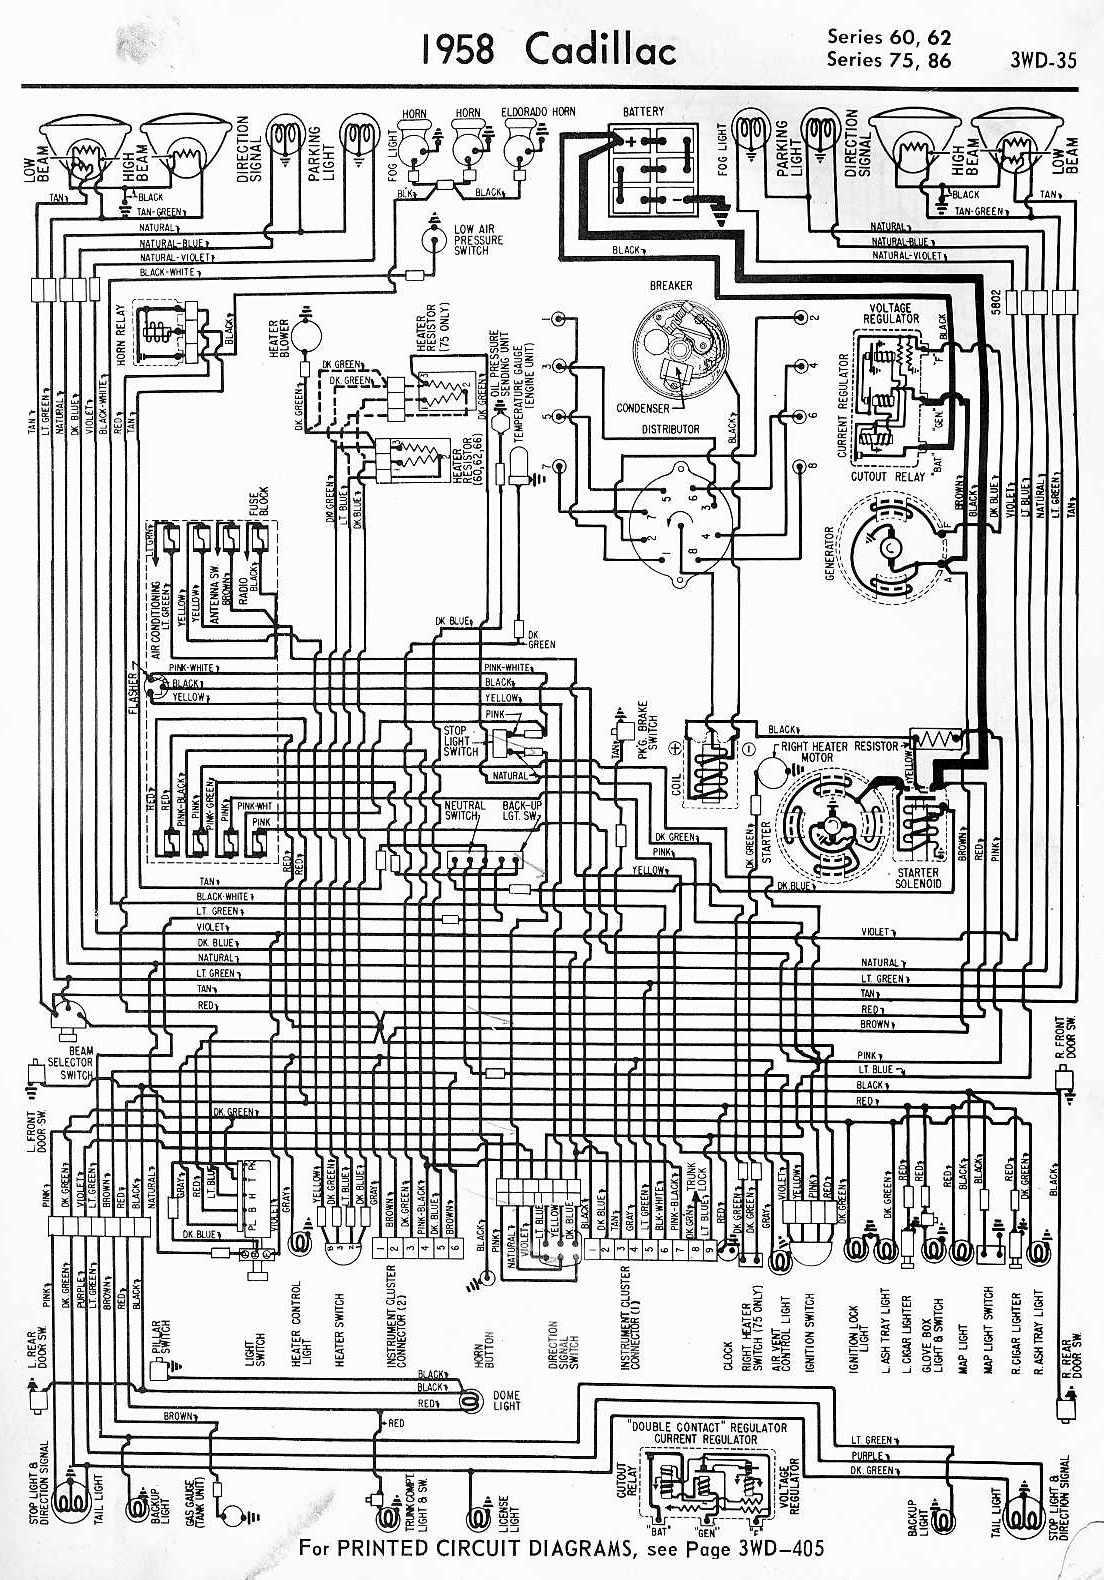 small resolution of 1968 cadillac air conditioner wiring diagram simple wiring schema 1994 cadillac deville speaker wiring diagram 1979 cadillac deville wiring diagram